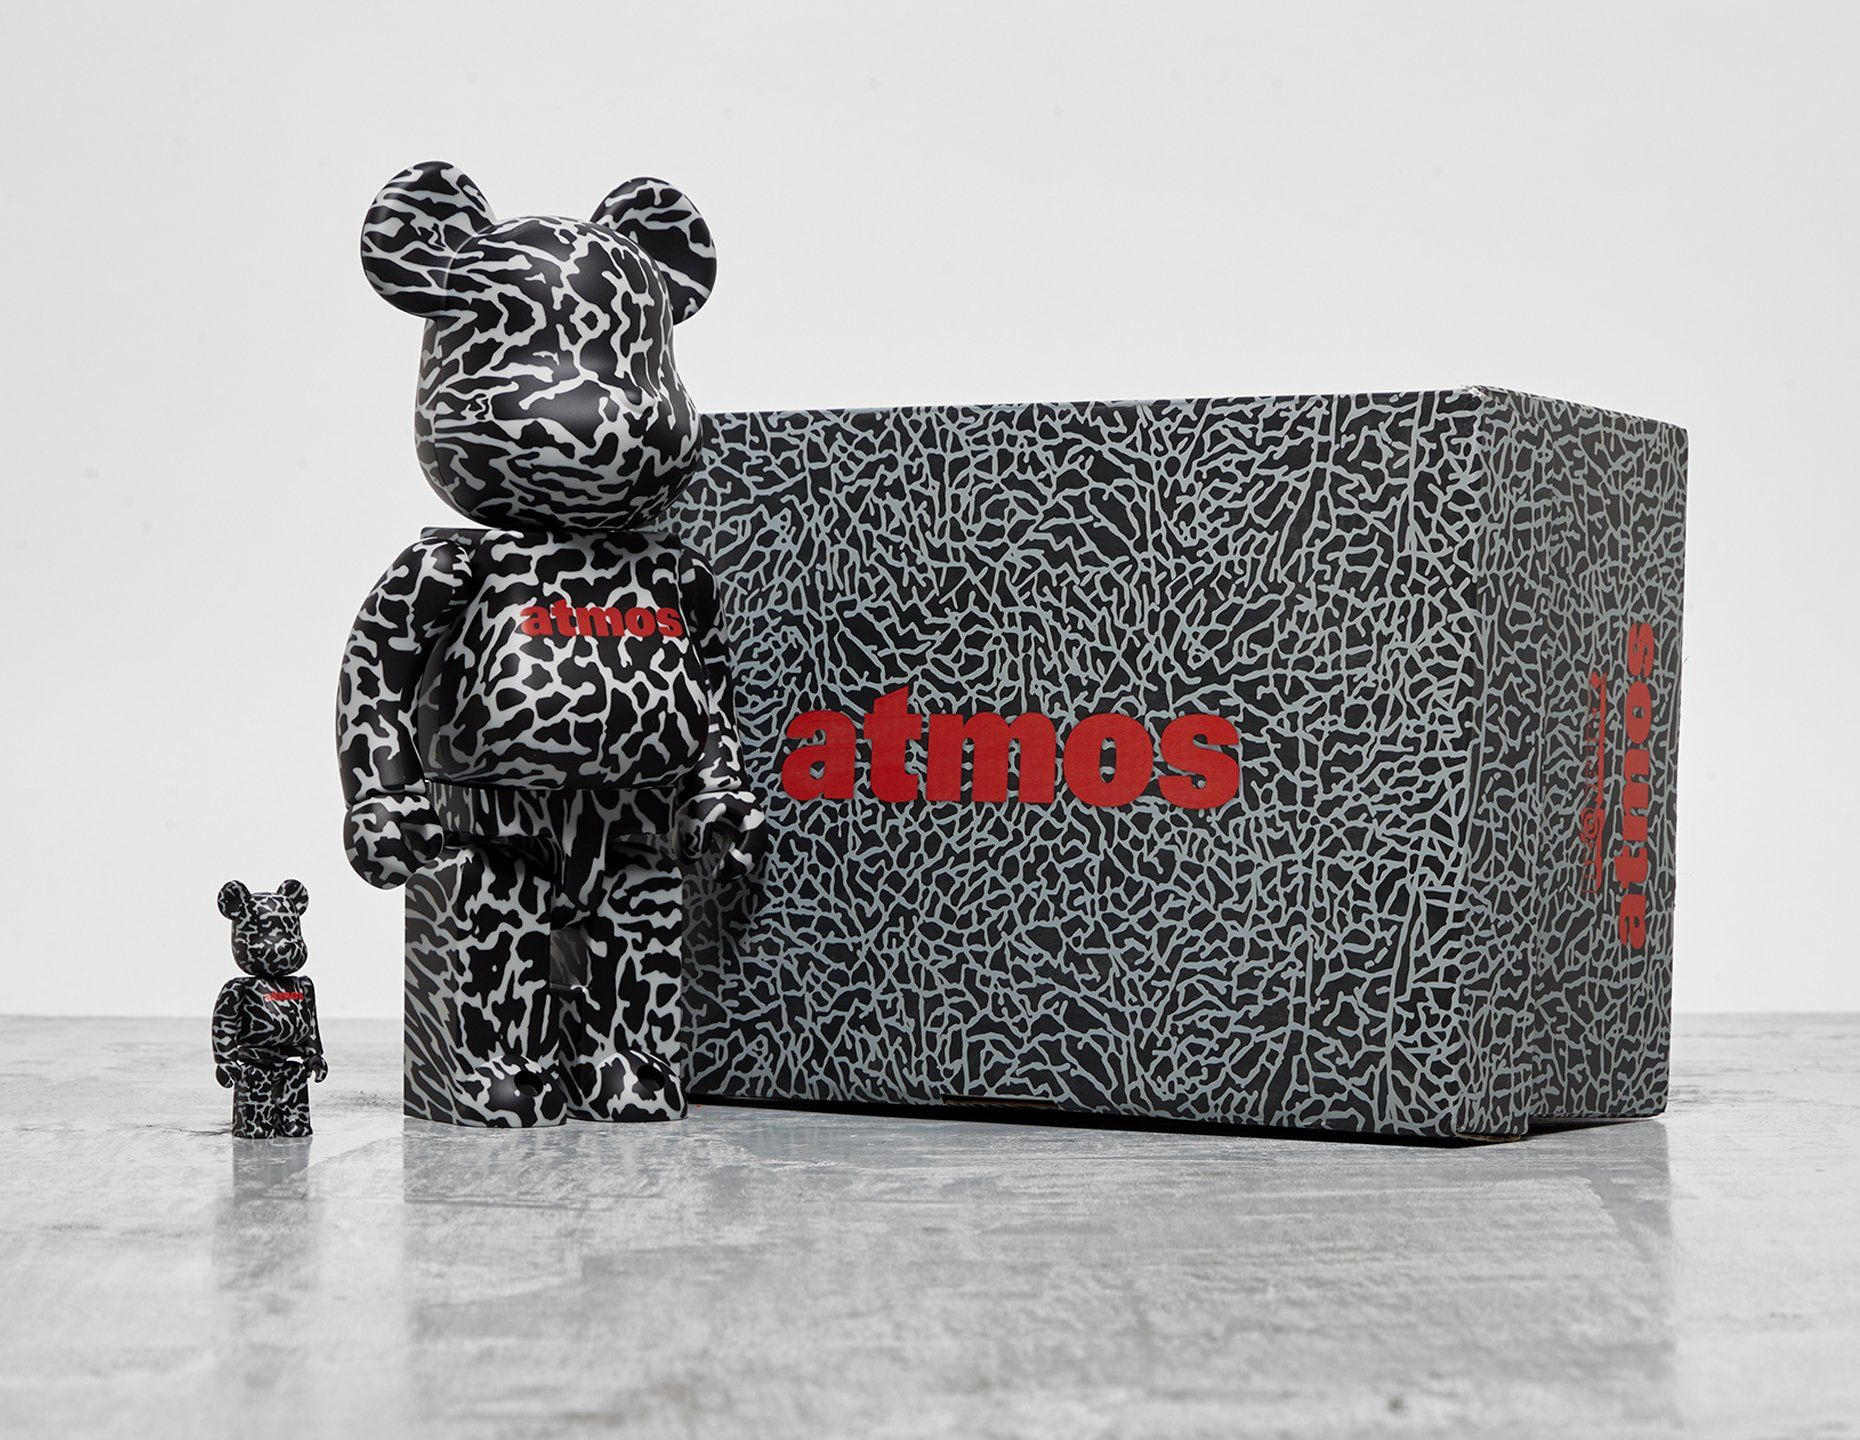 Medicom x atmos 'Elephant' Bearbrick 100% + 400%